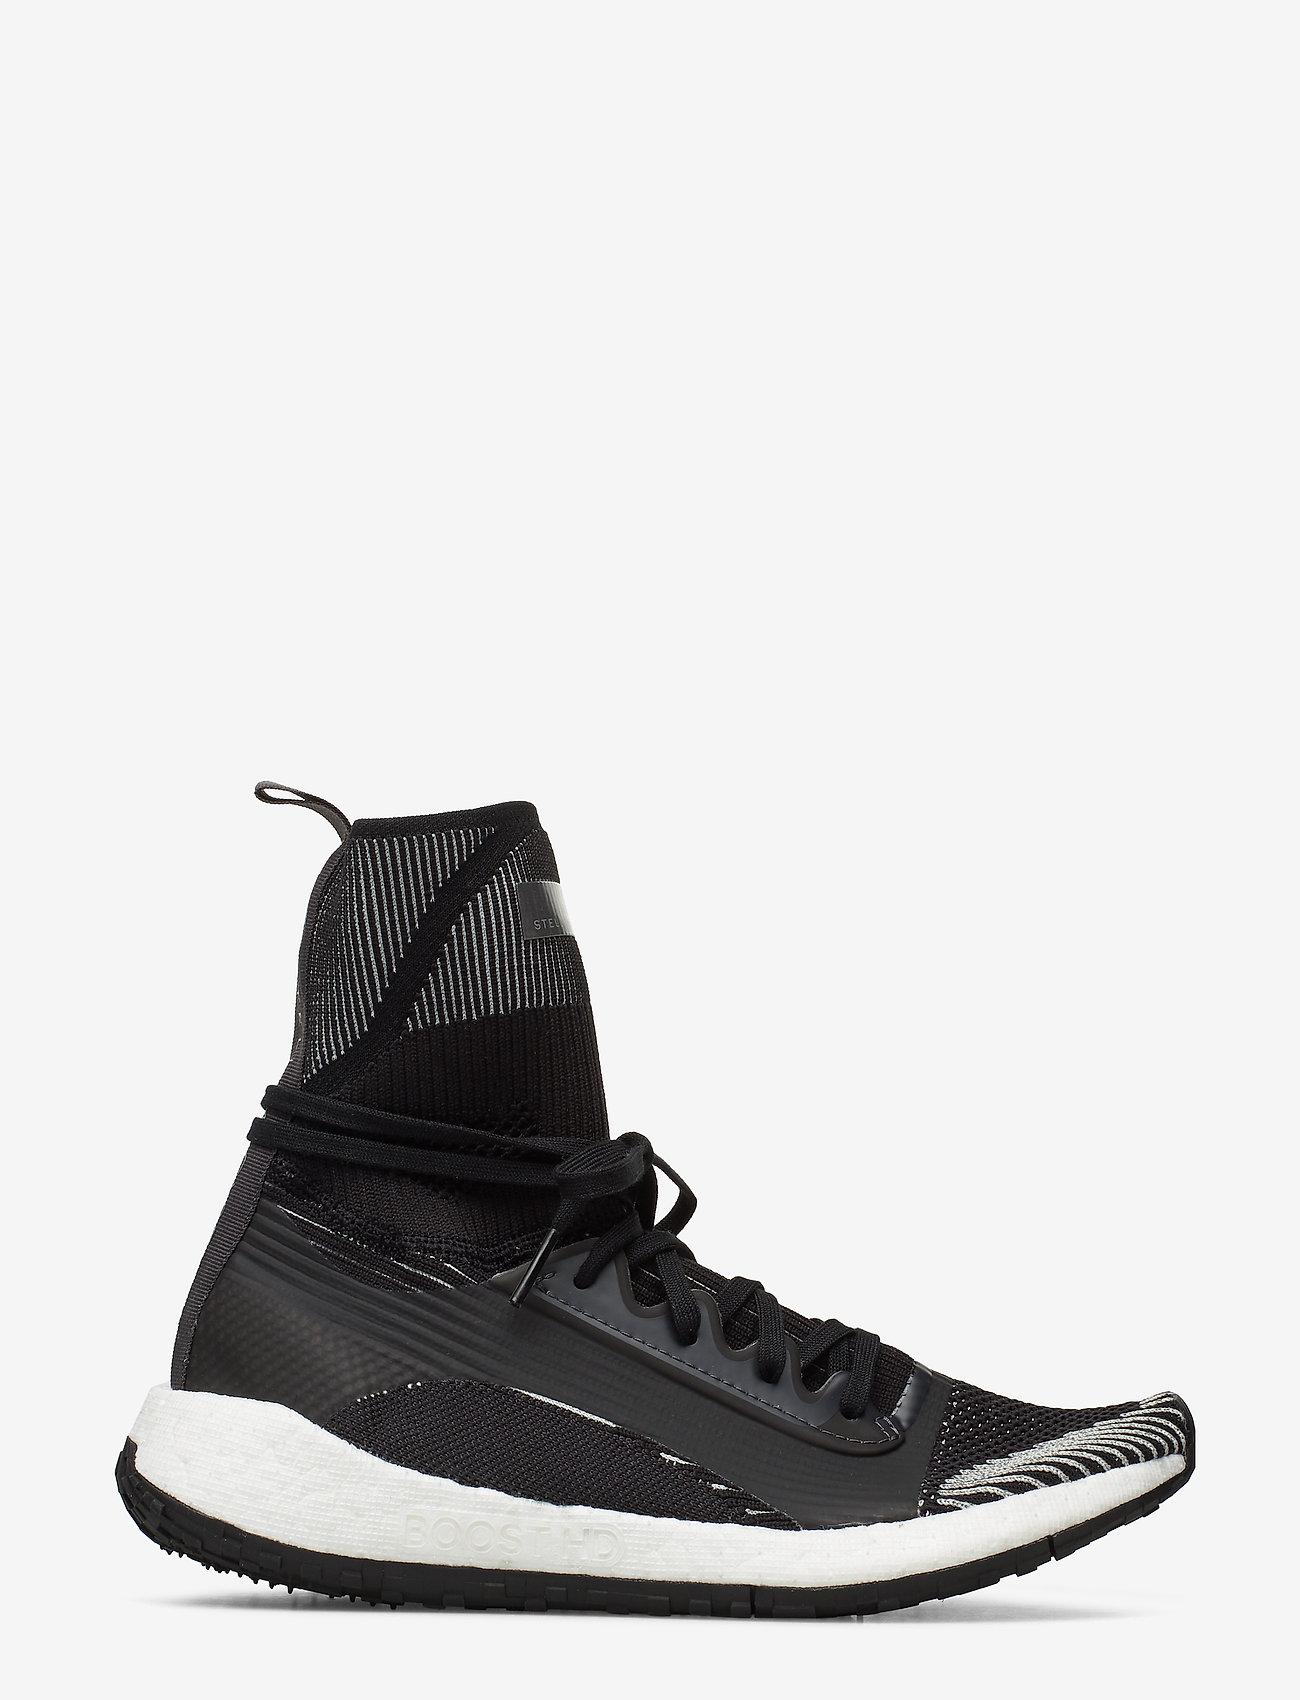 Adidas By Stella Mccartney Pulseboost Hd Mid S. - Sportskor Utiblk/dusros/utiblk